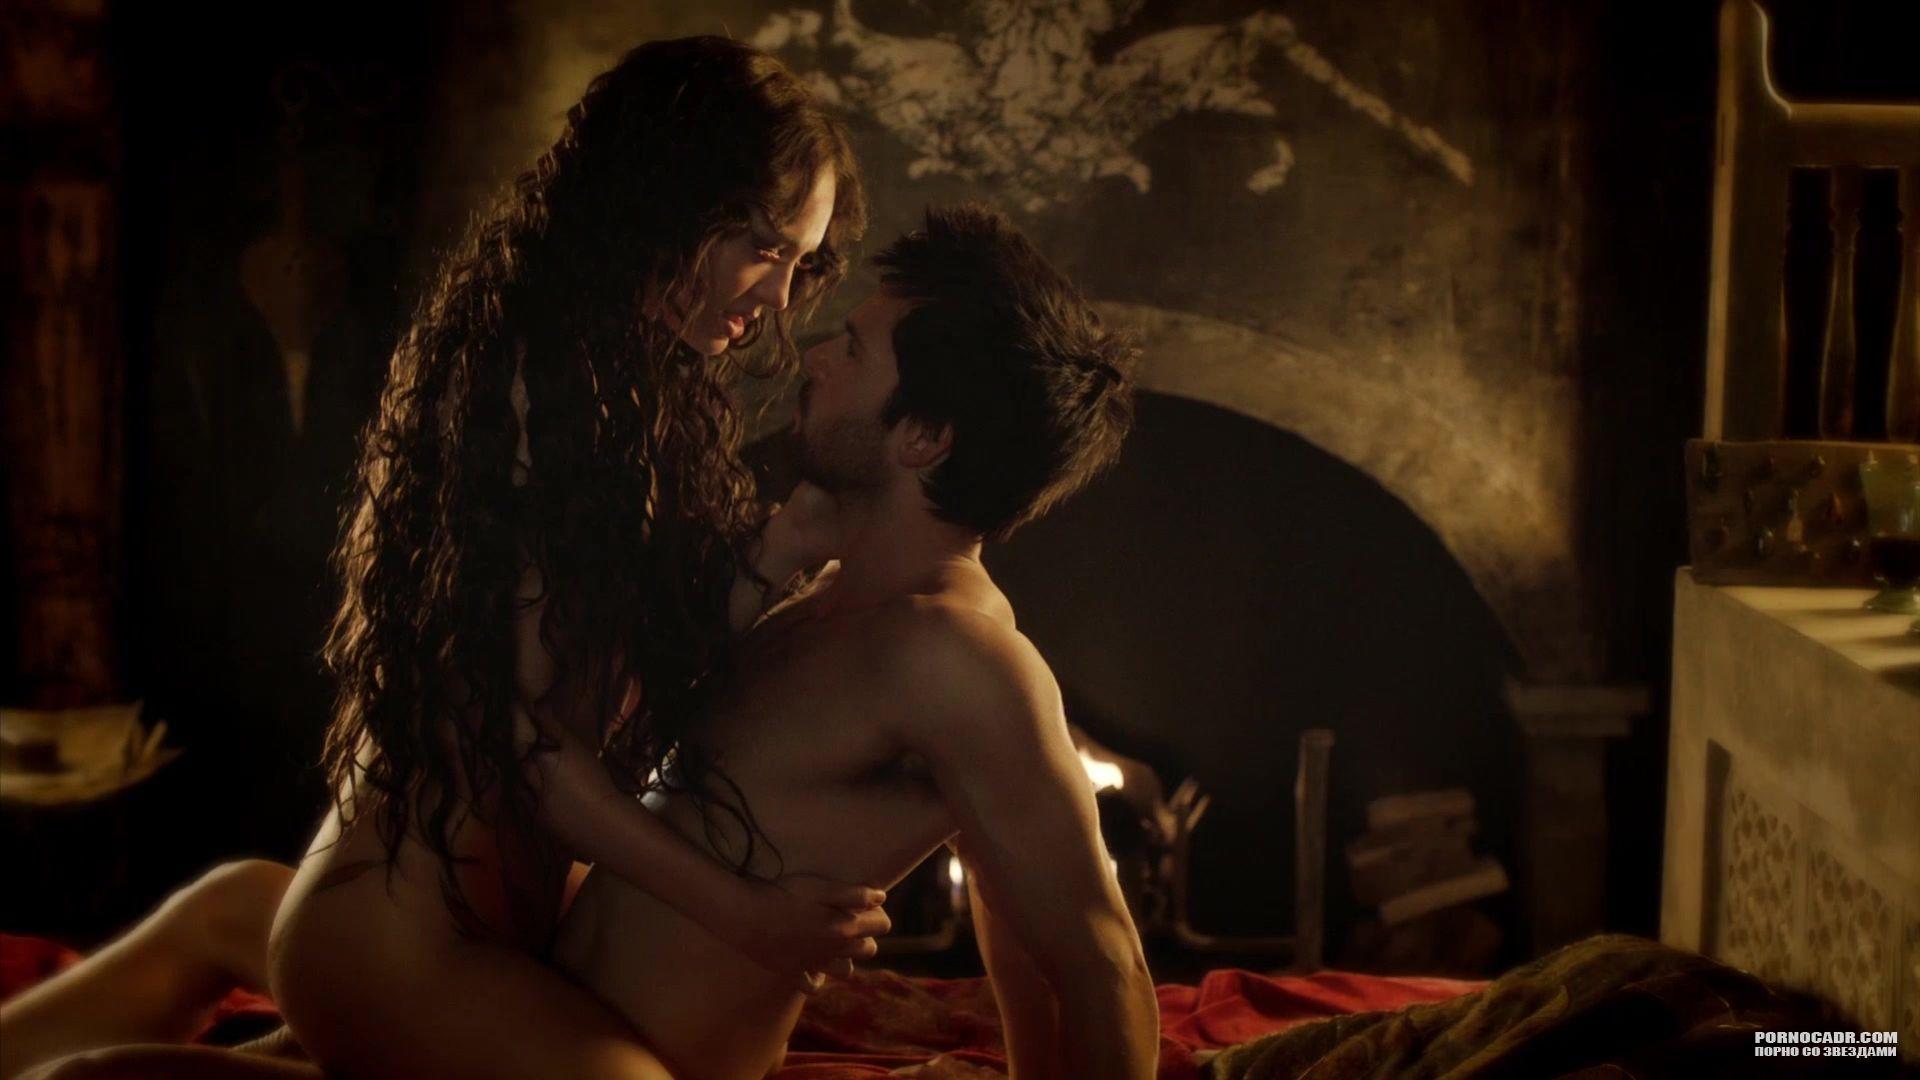 panty-hot-movie-sex